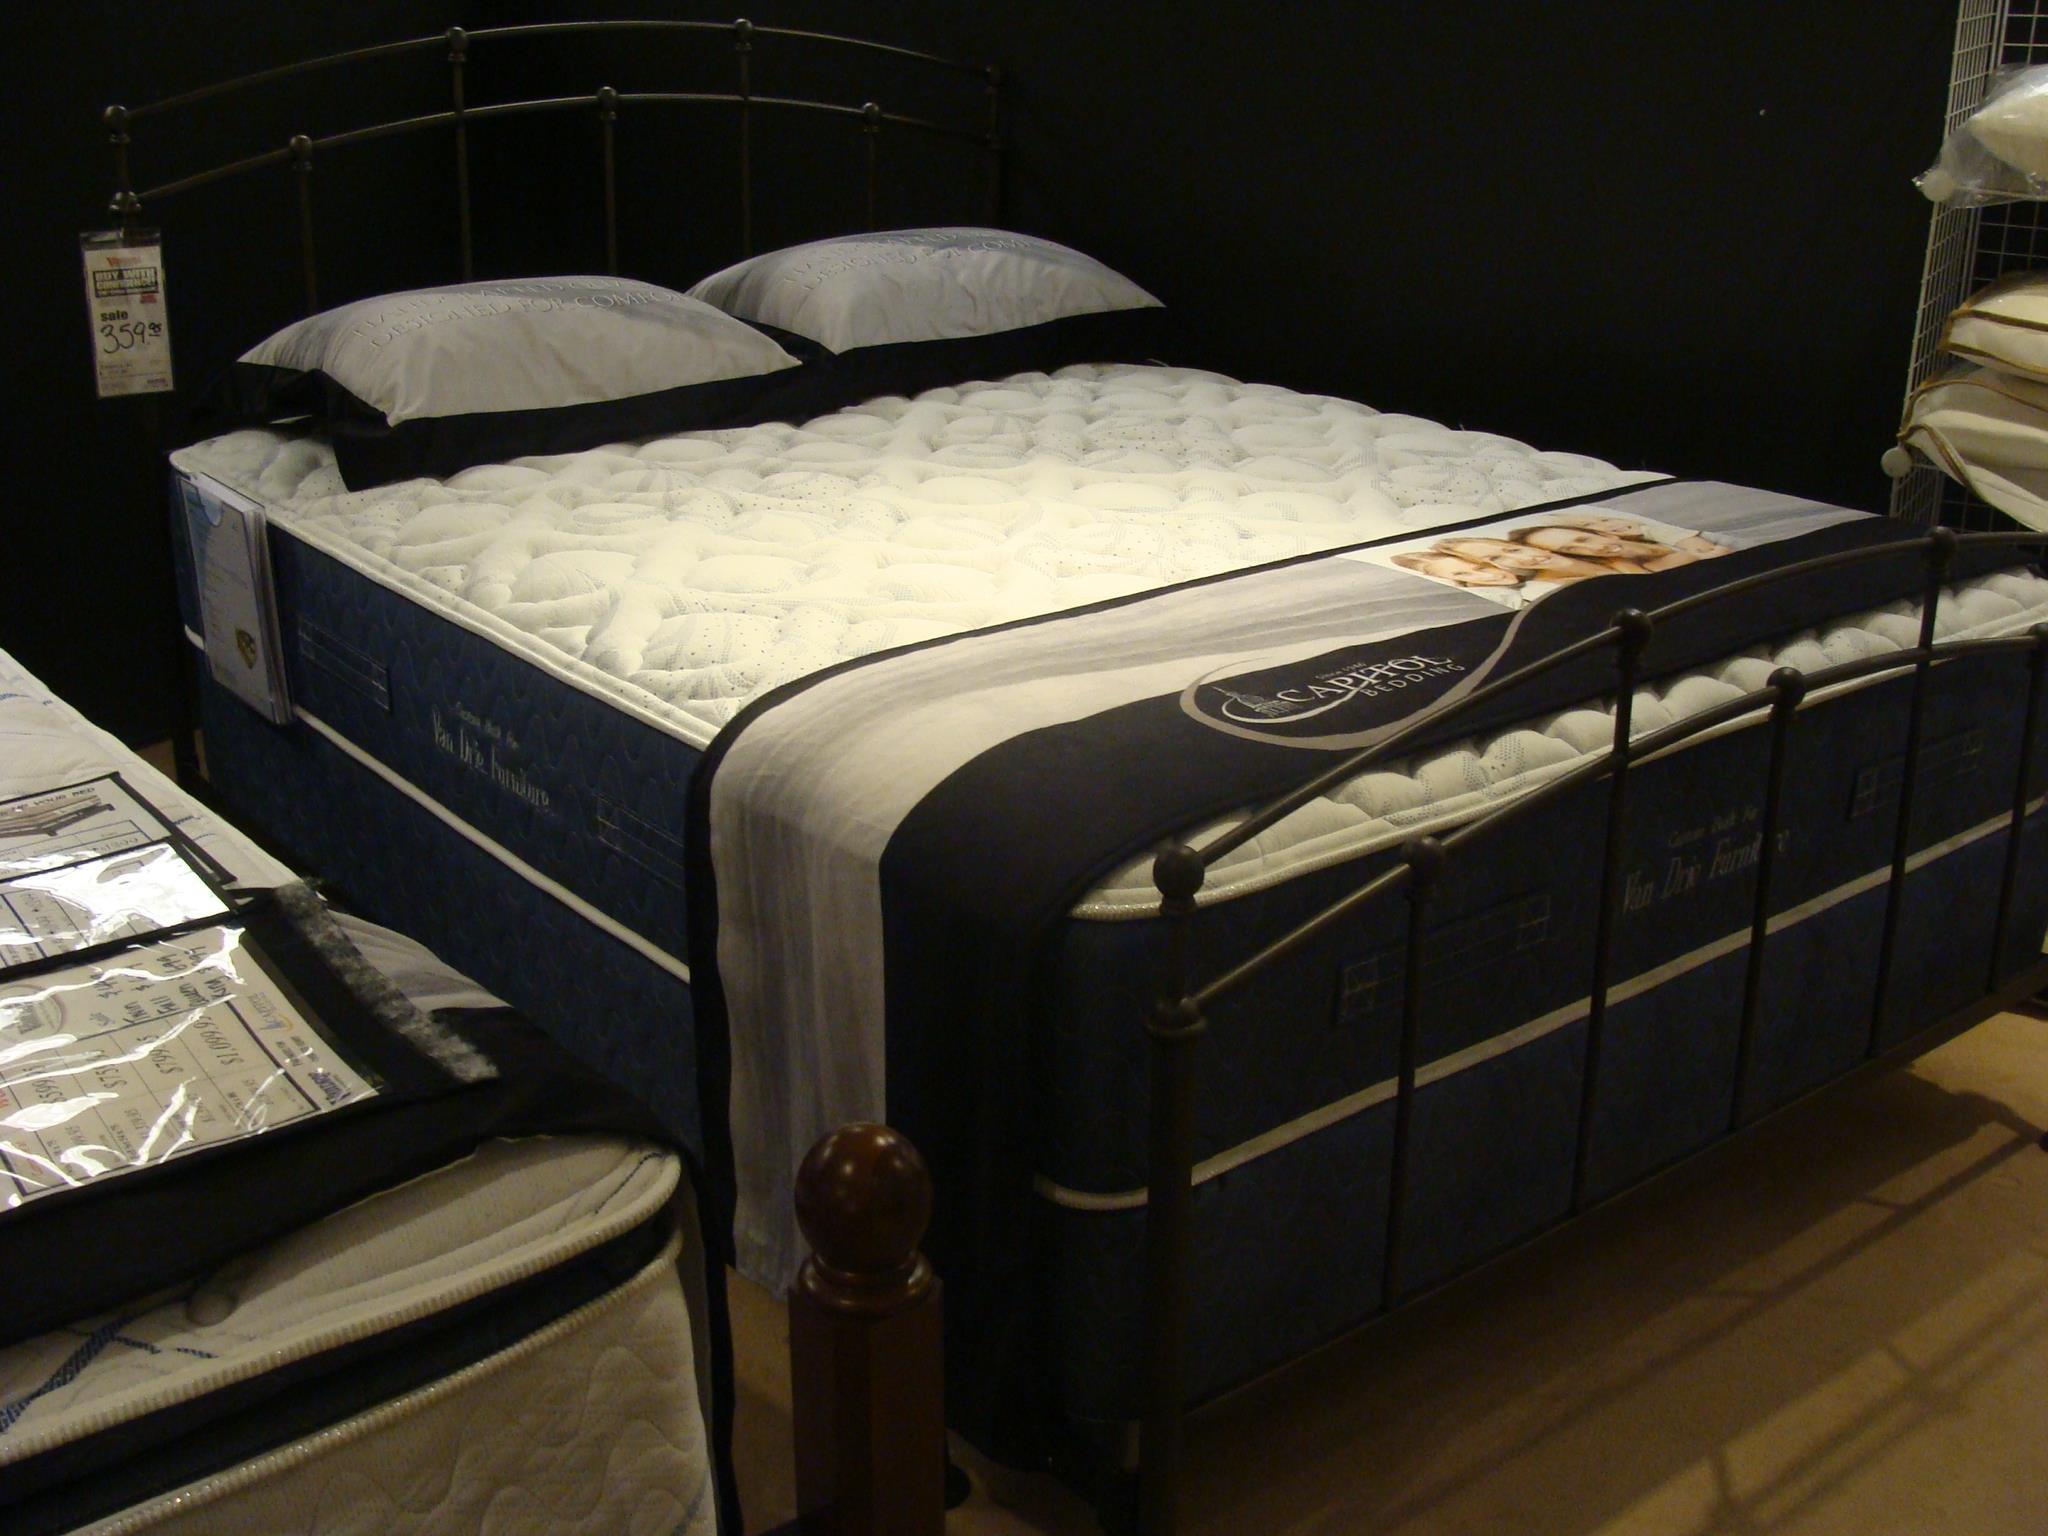 Capitol Bedding Melbourne Firm King Mattress Only - Item Number: Innerspring-K